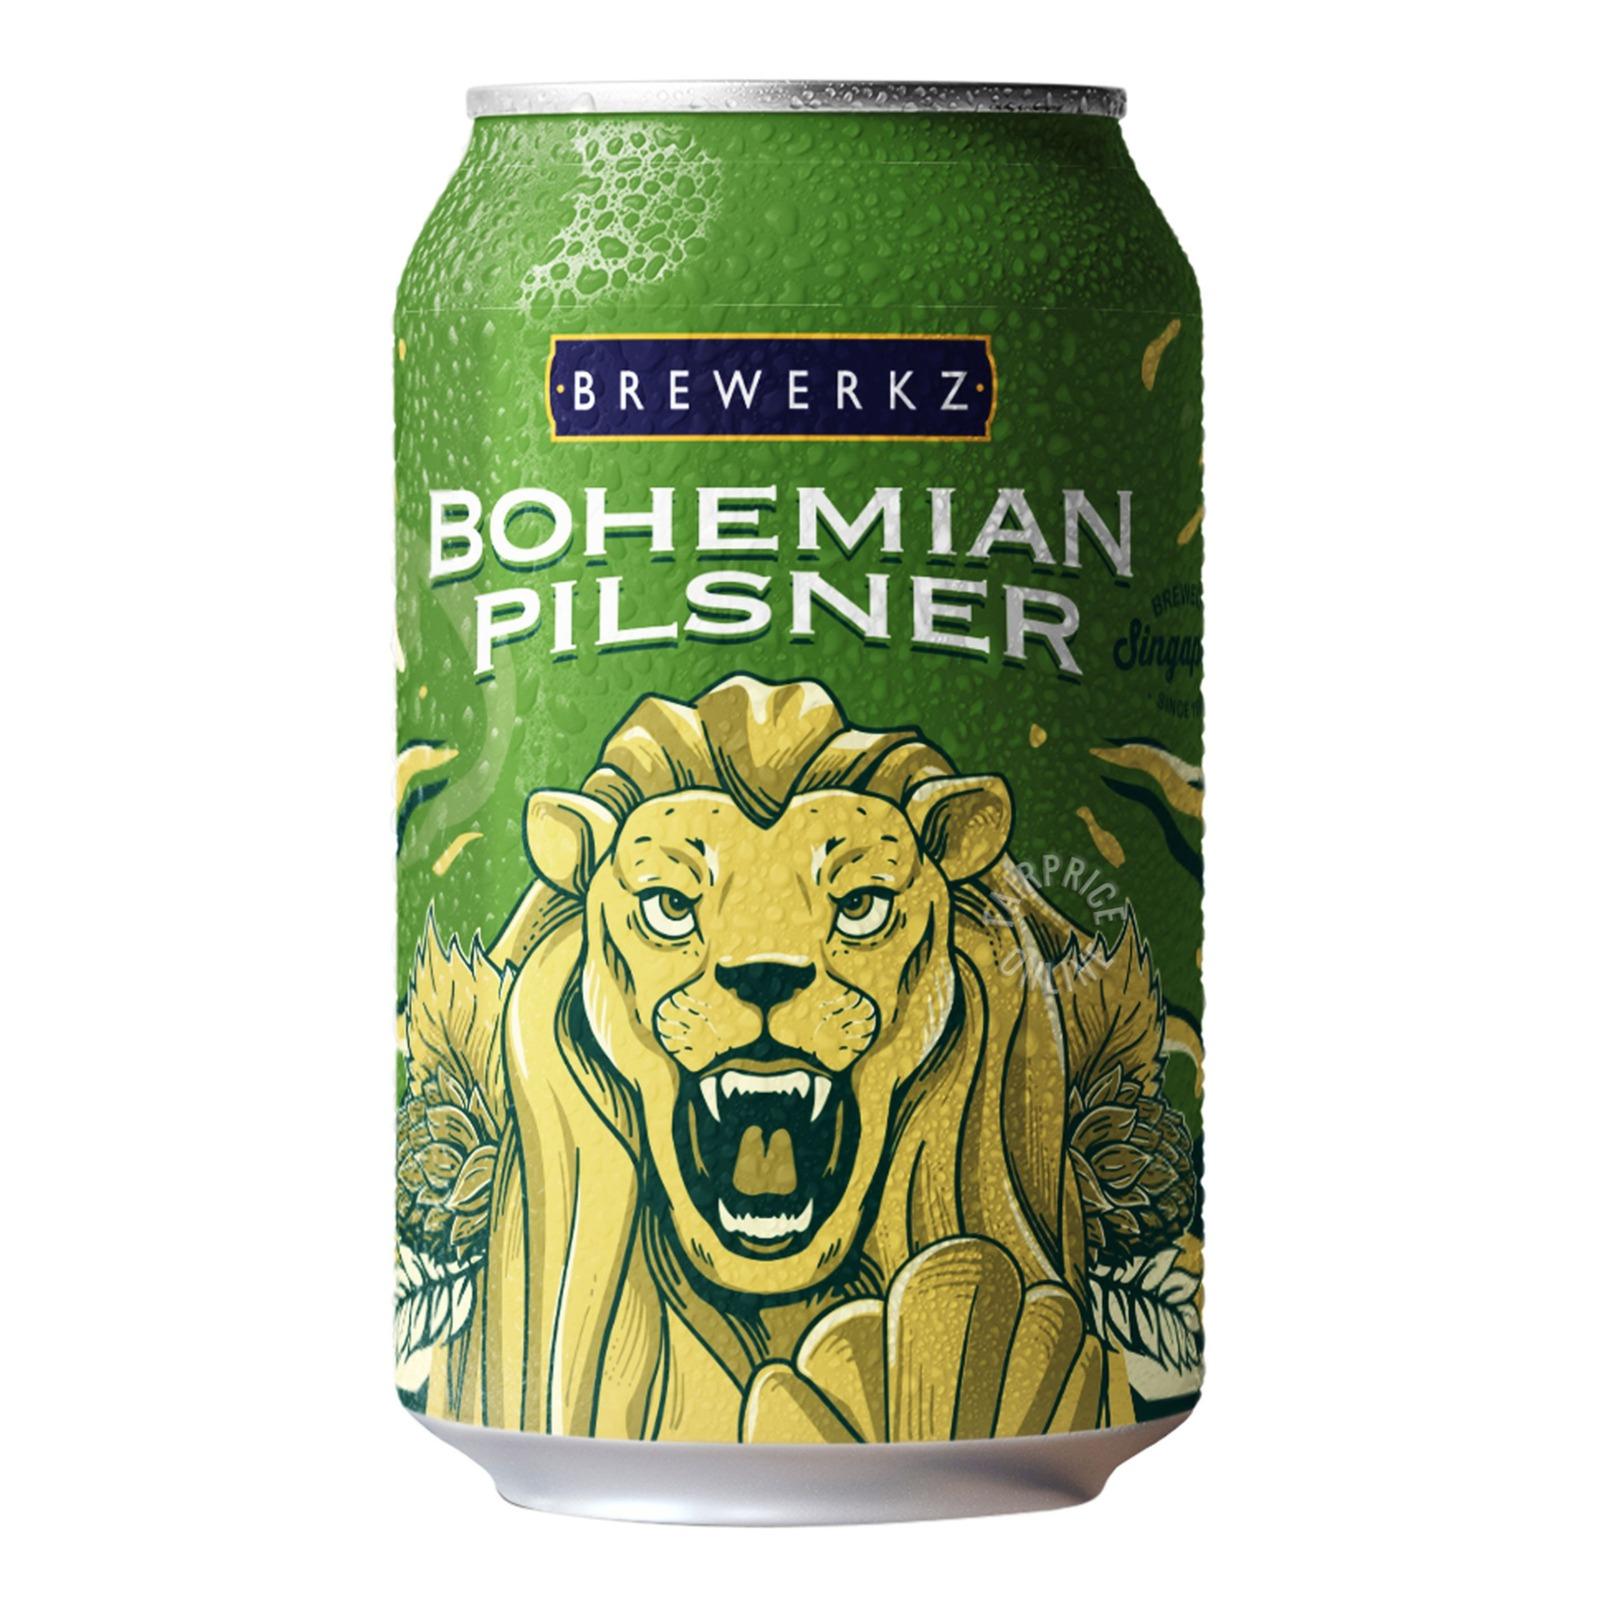 Brewerkz Can Beer - Bohemian Pilsner